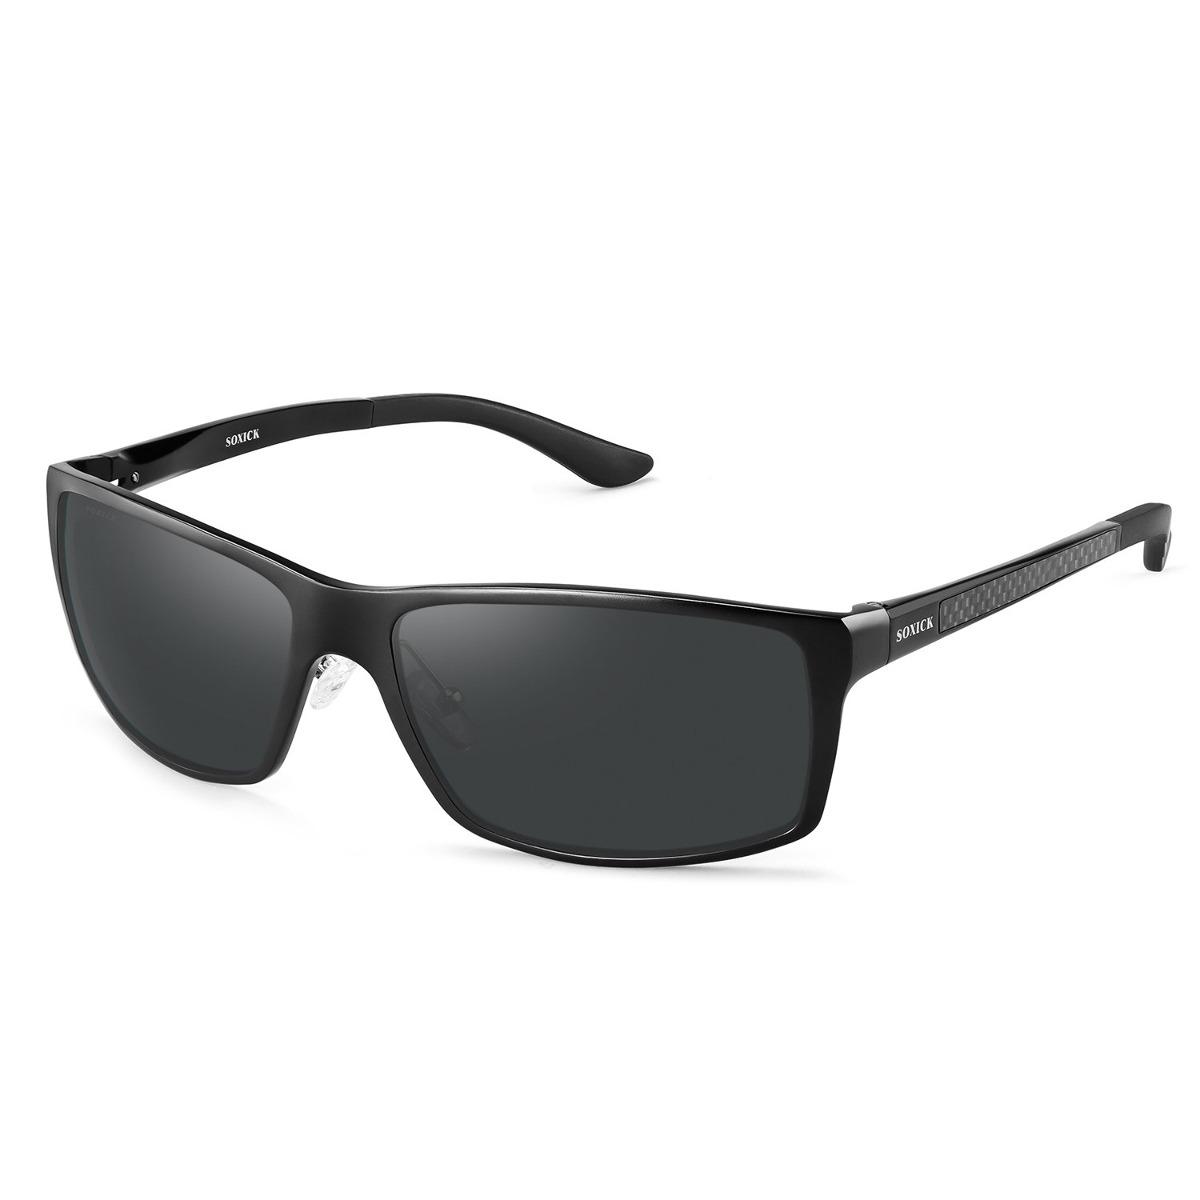 18a246b23c6 soxick polarized sports sunglasses para hombres hd drivin. Cargando zoom.